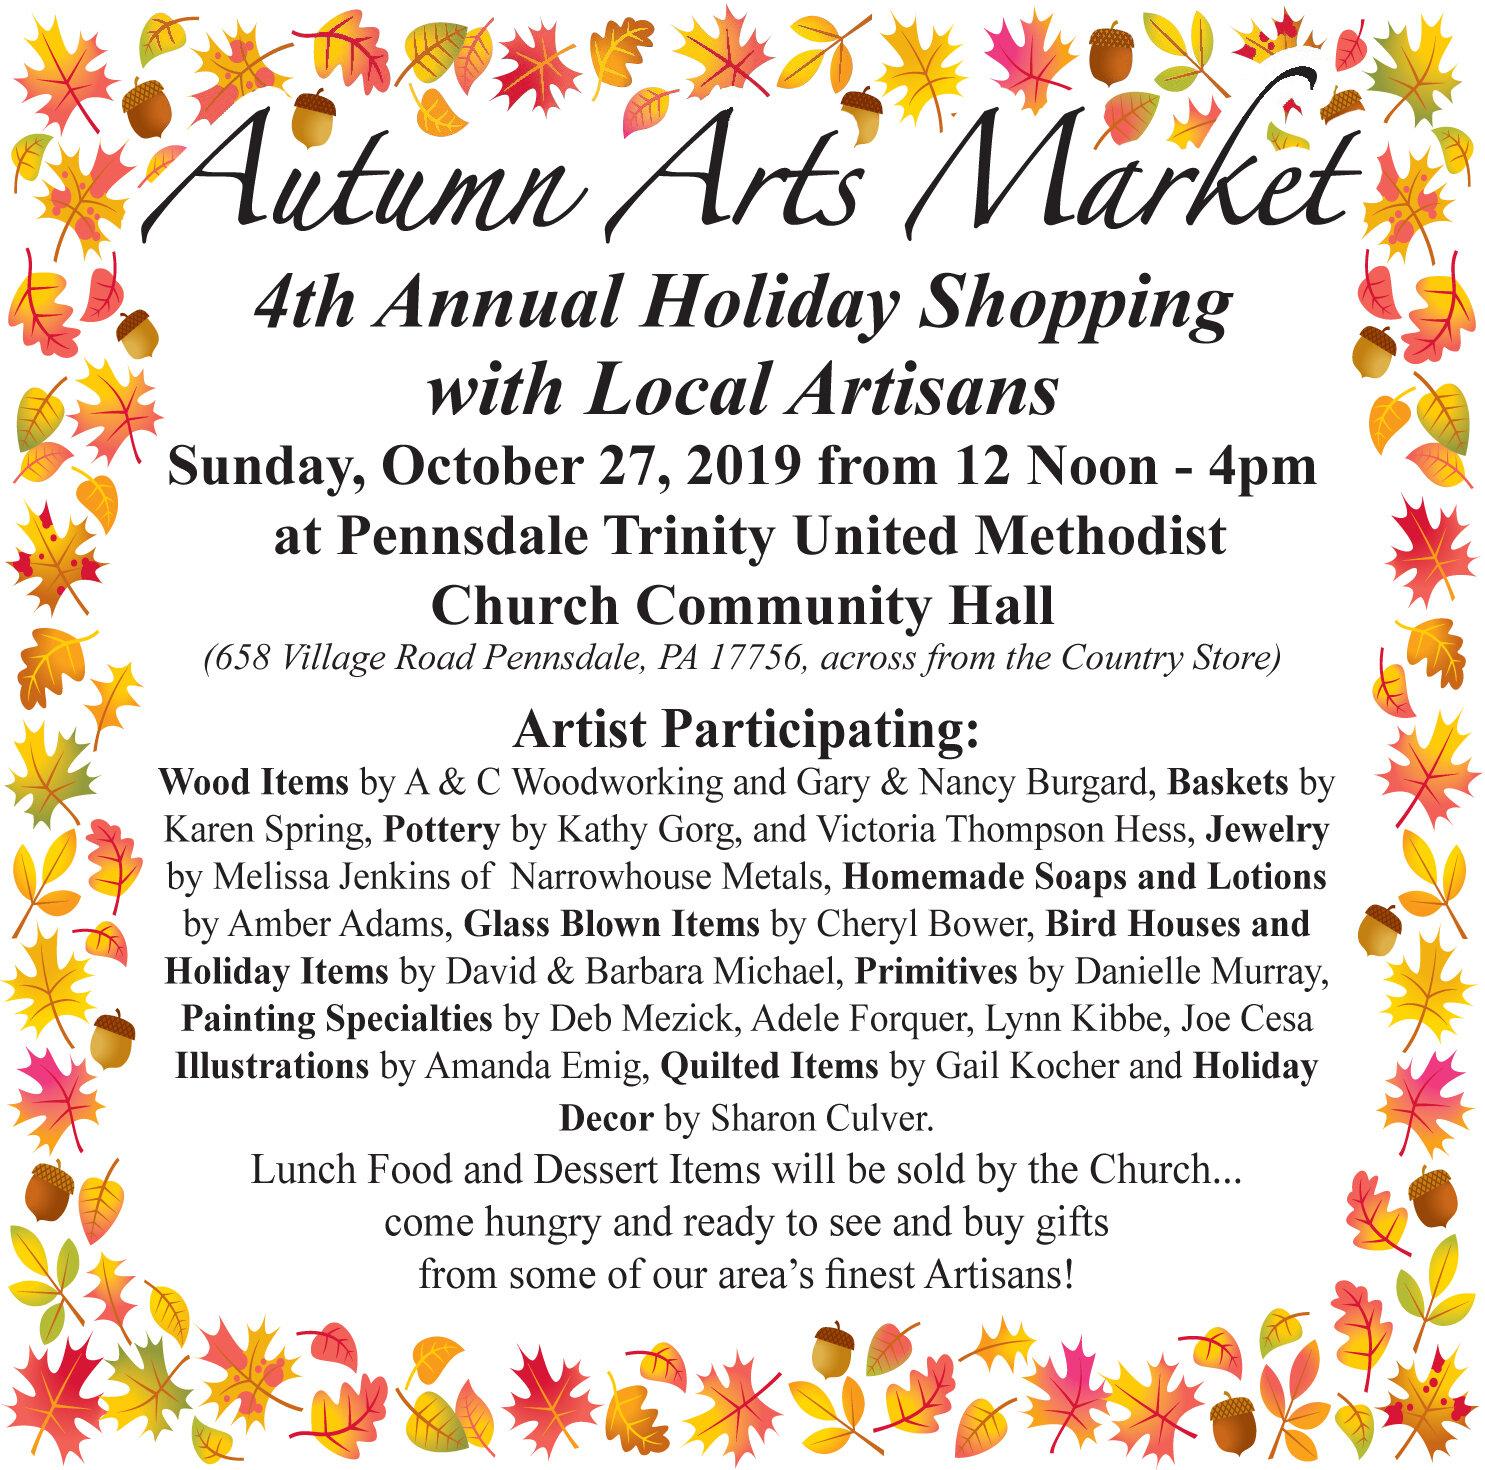 Autumn Arts Market 2019 Color Ad.jpg